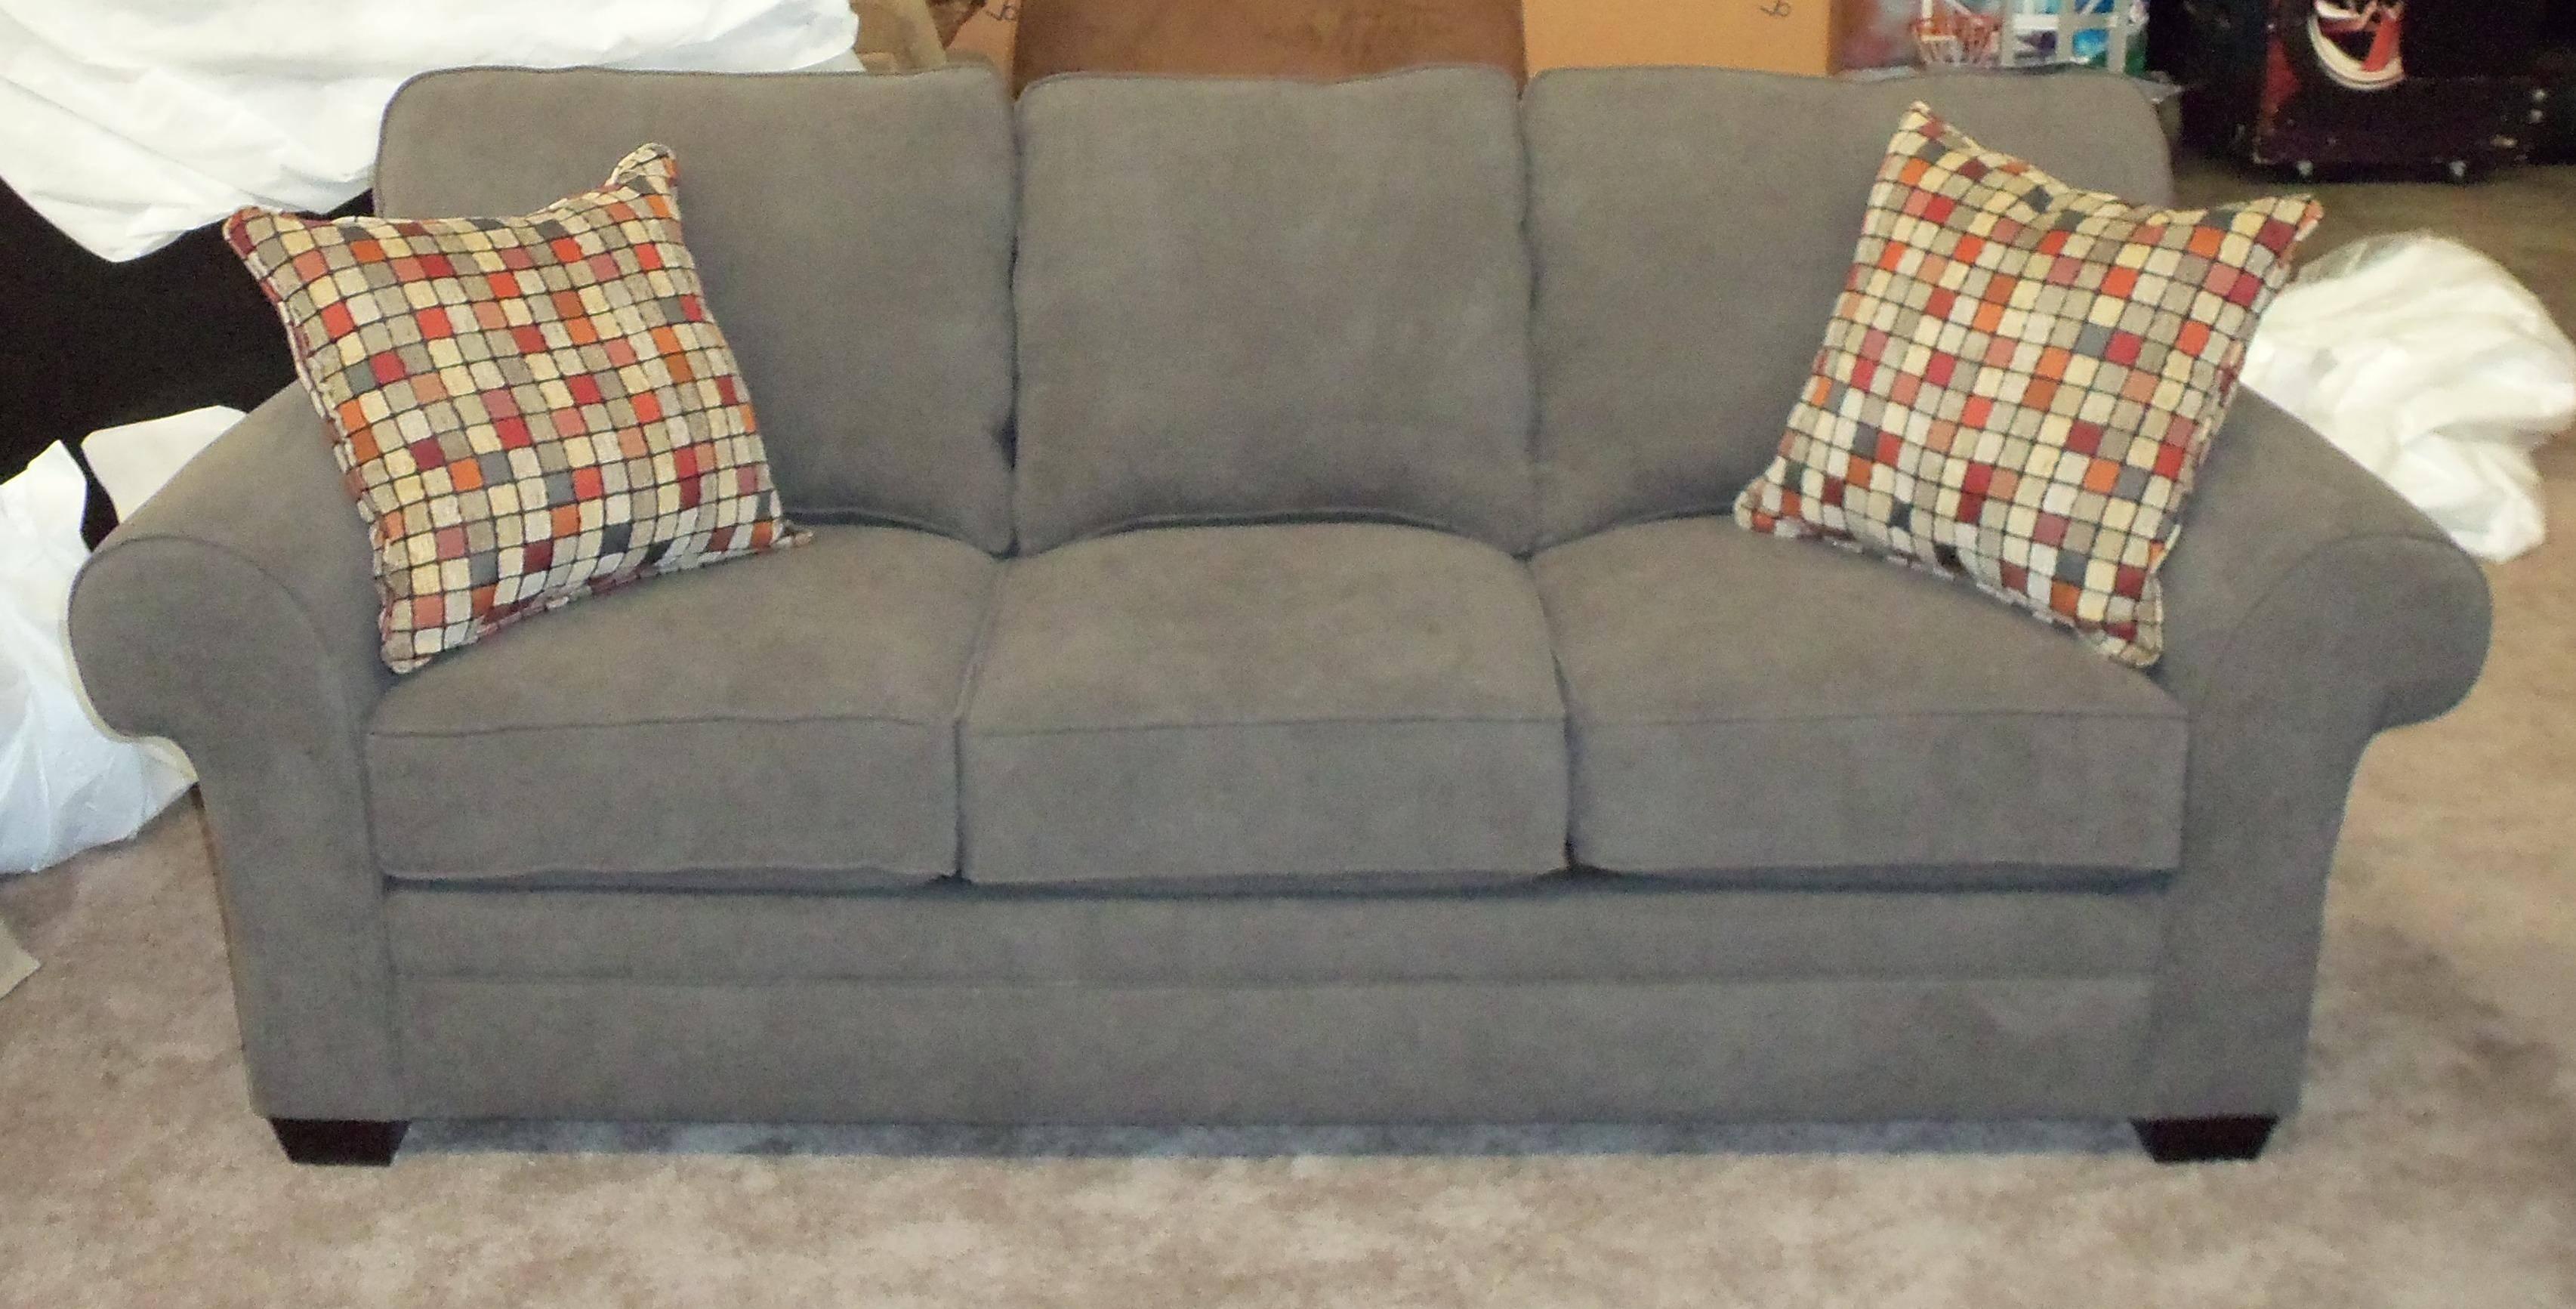 20 Ideas Of Broyhill Harrison Sofas | Sofa Ideas within Broyhill Harrison Sofas (Image 1 of 15)